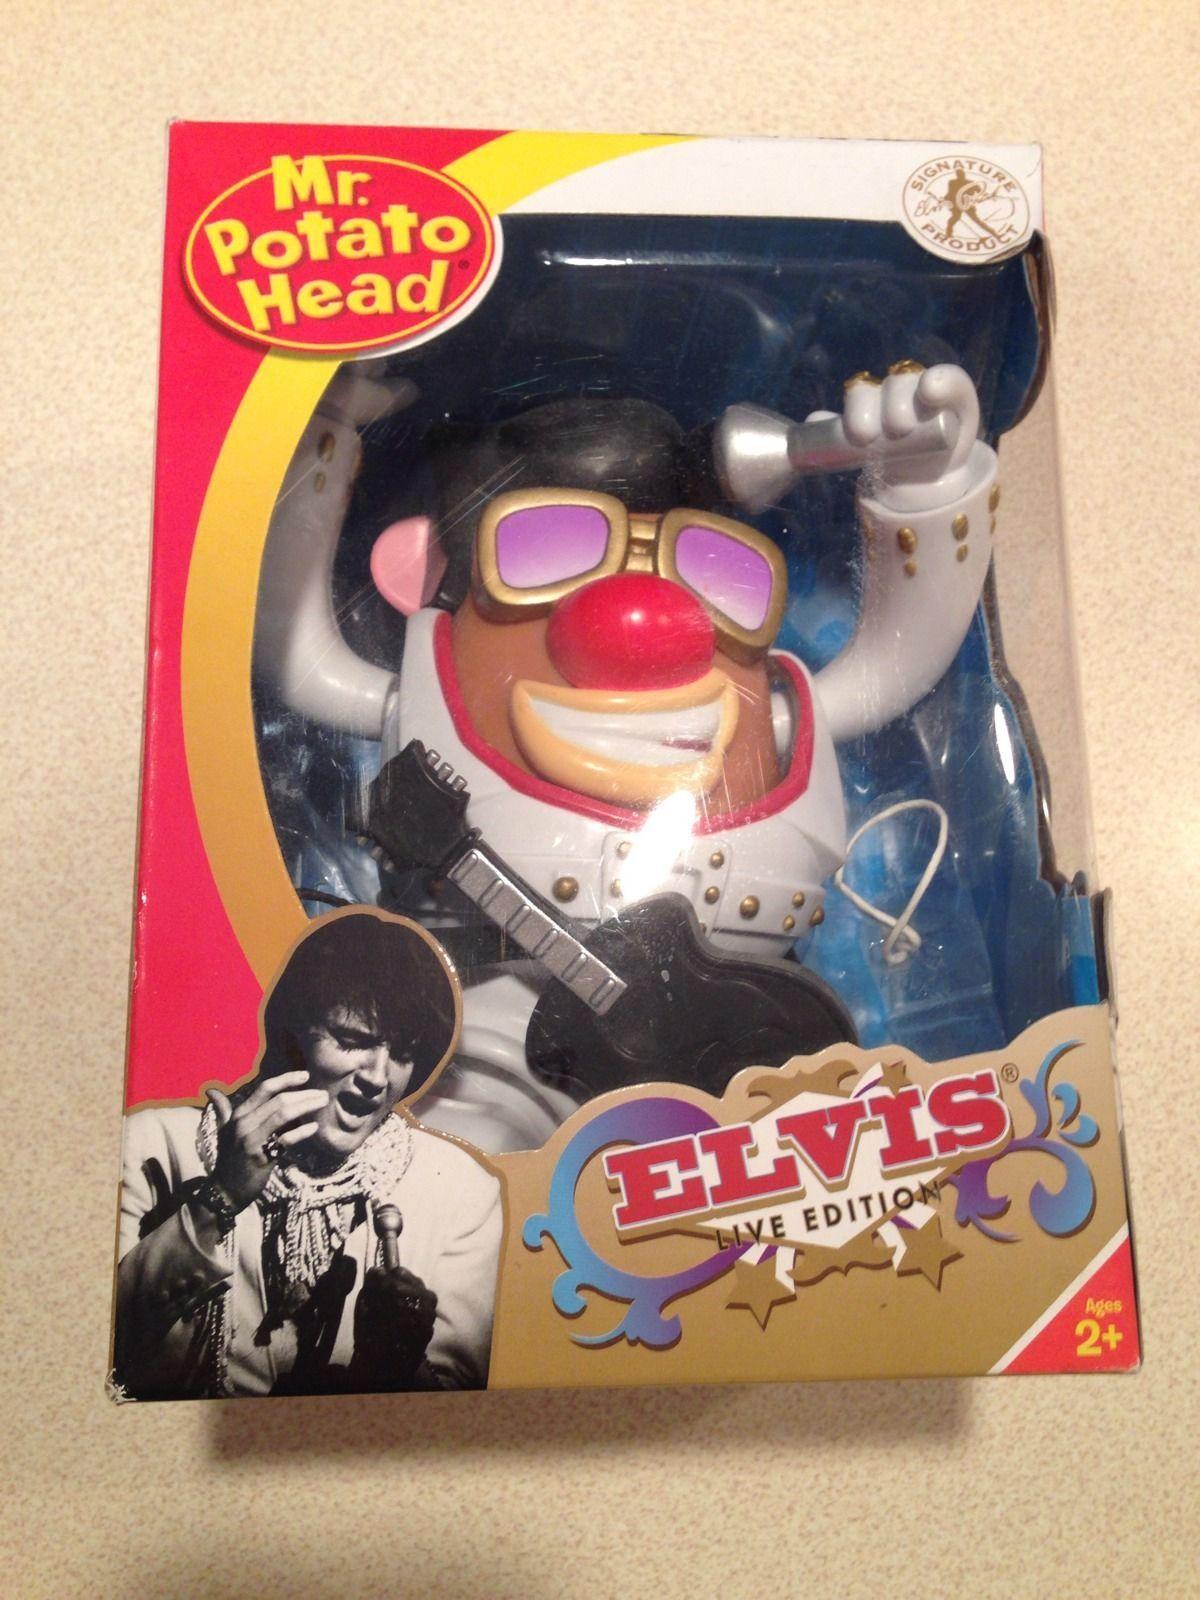 NEW Elvis Presley THE KING Mr. Potato Head Doll Toy picclick.com